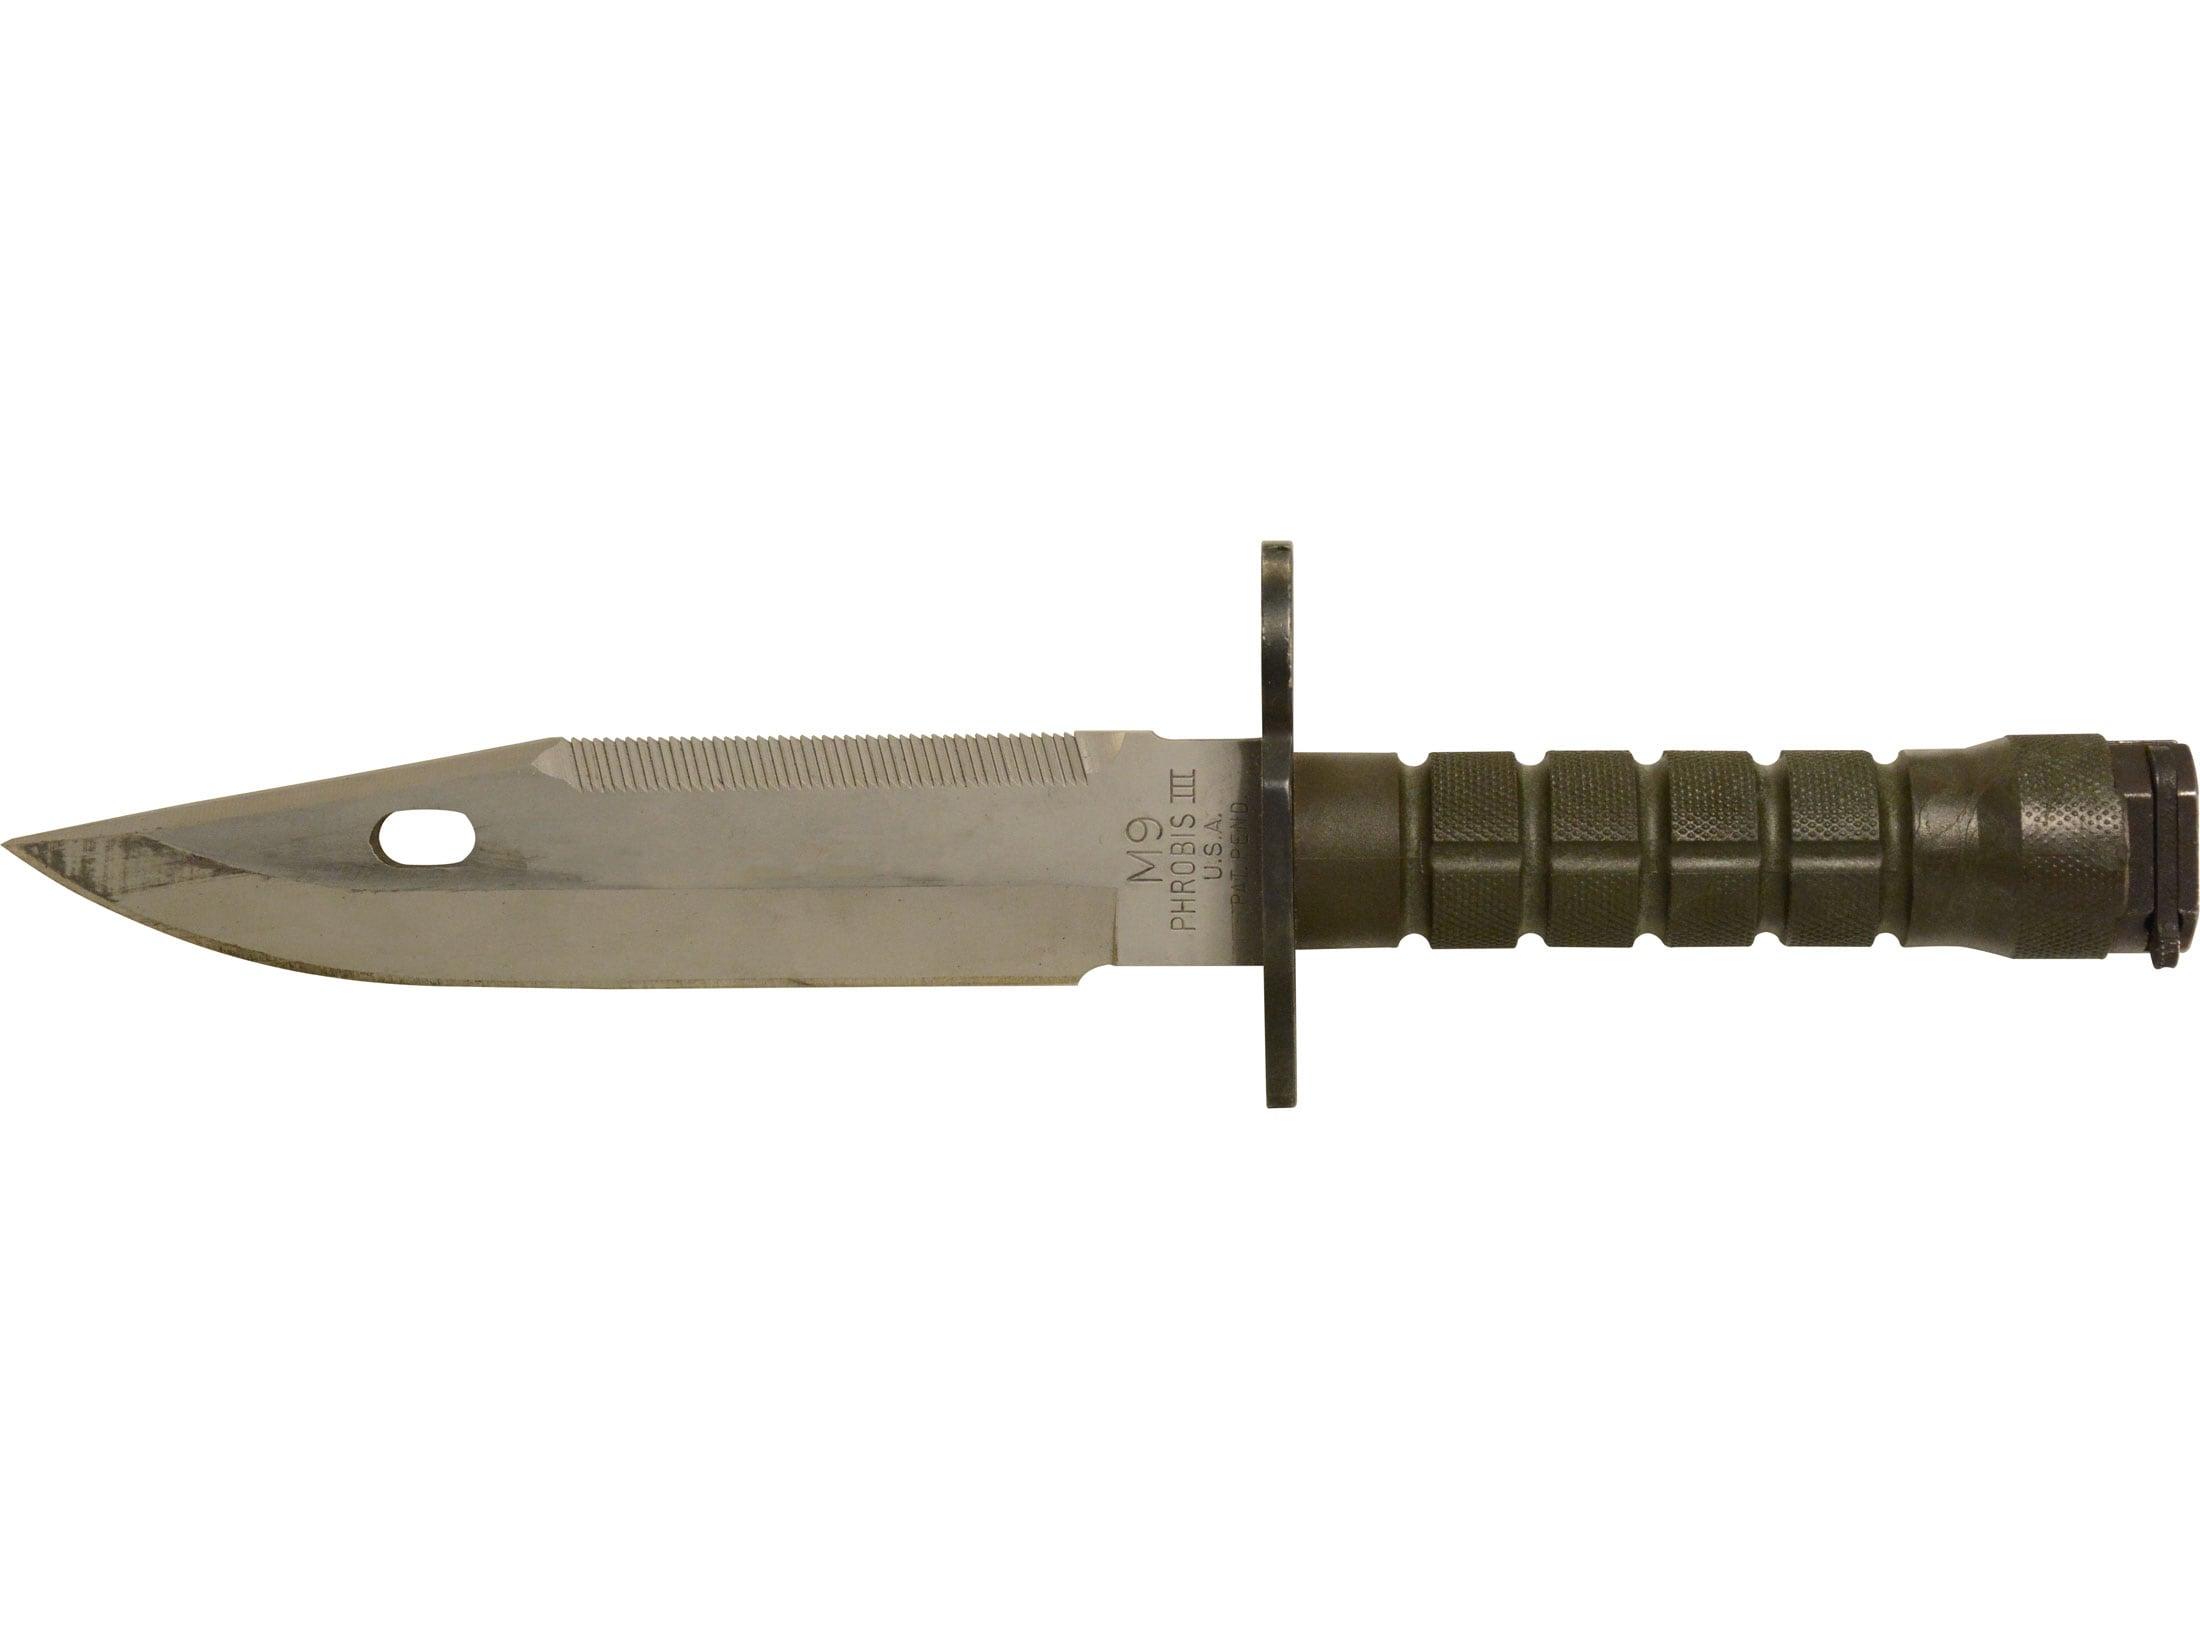 Military Surplus Phrobis M9 Bayonet Grade 1